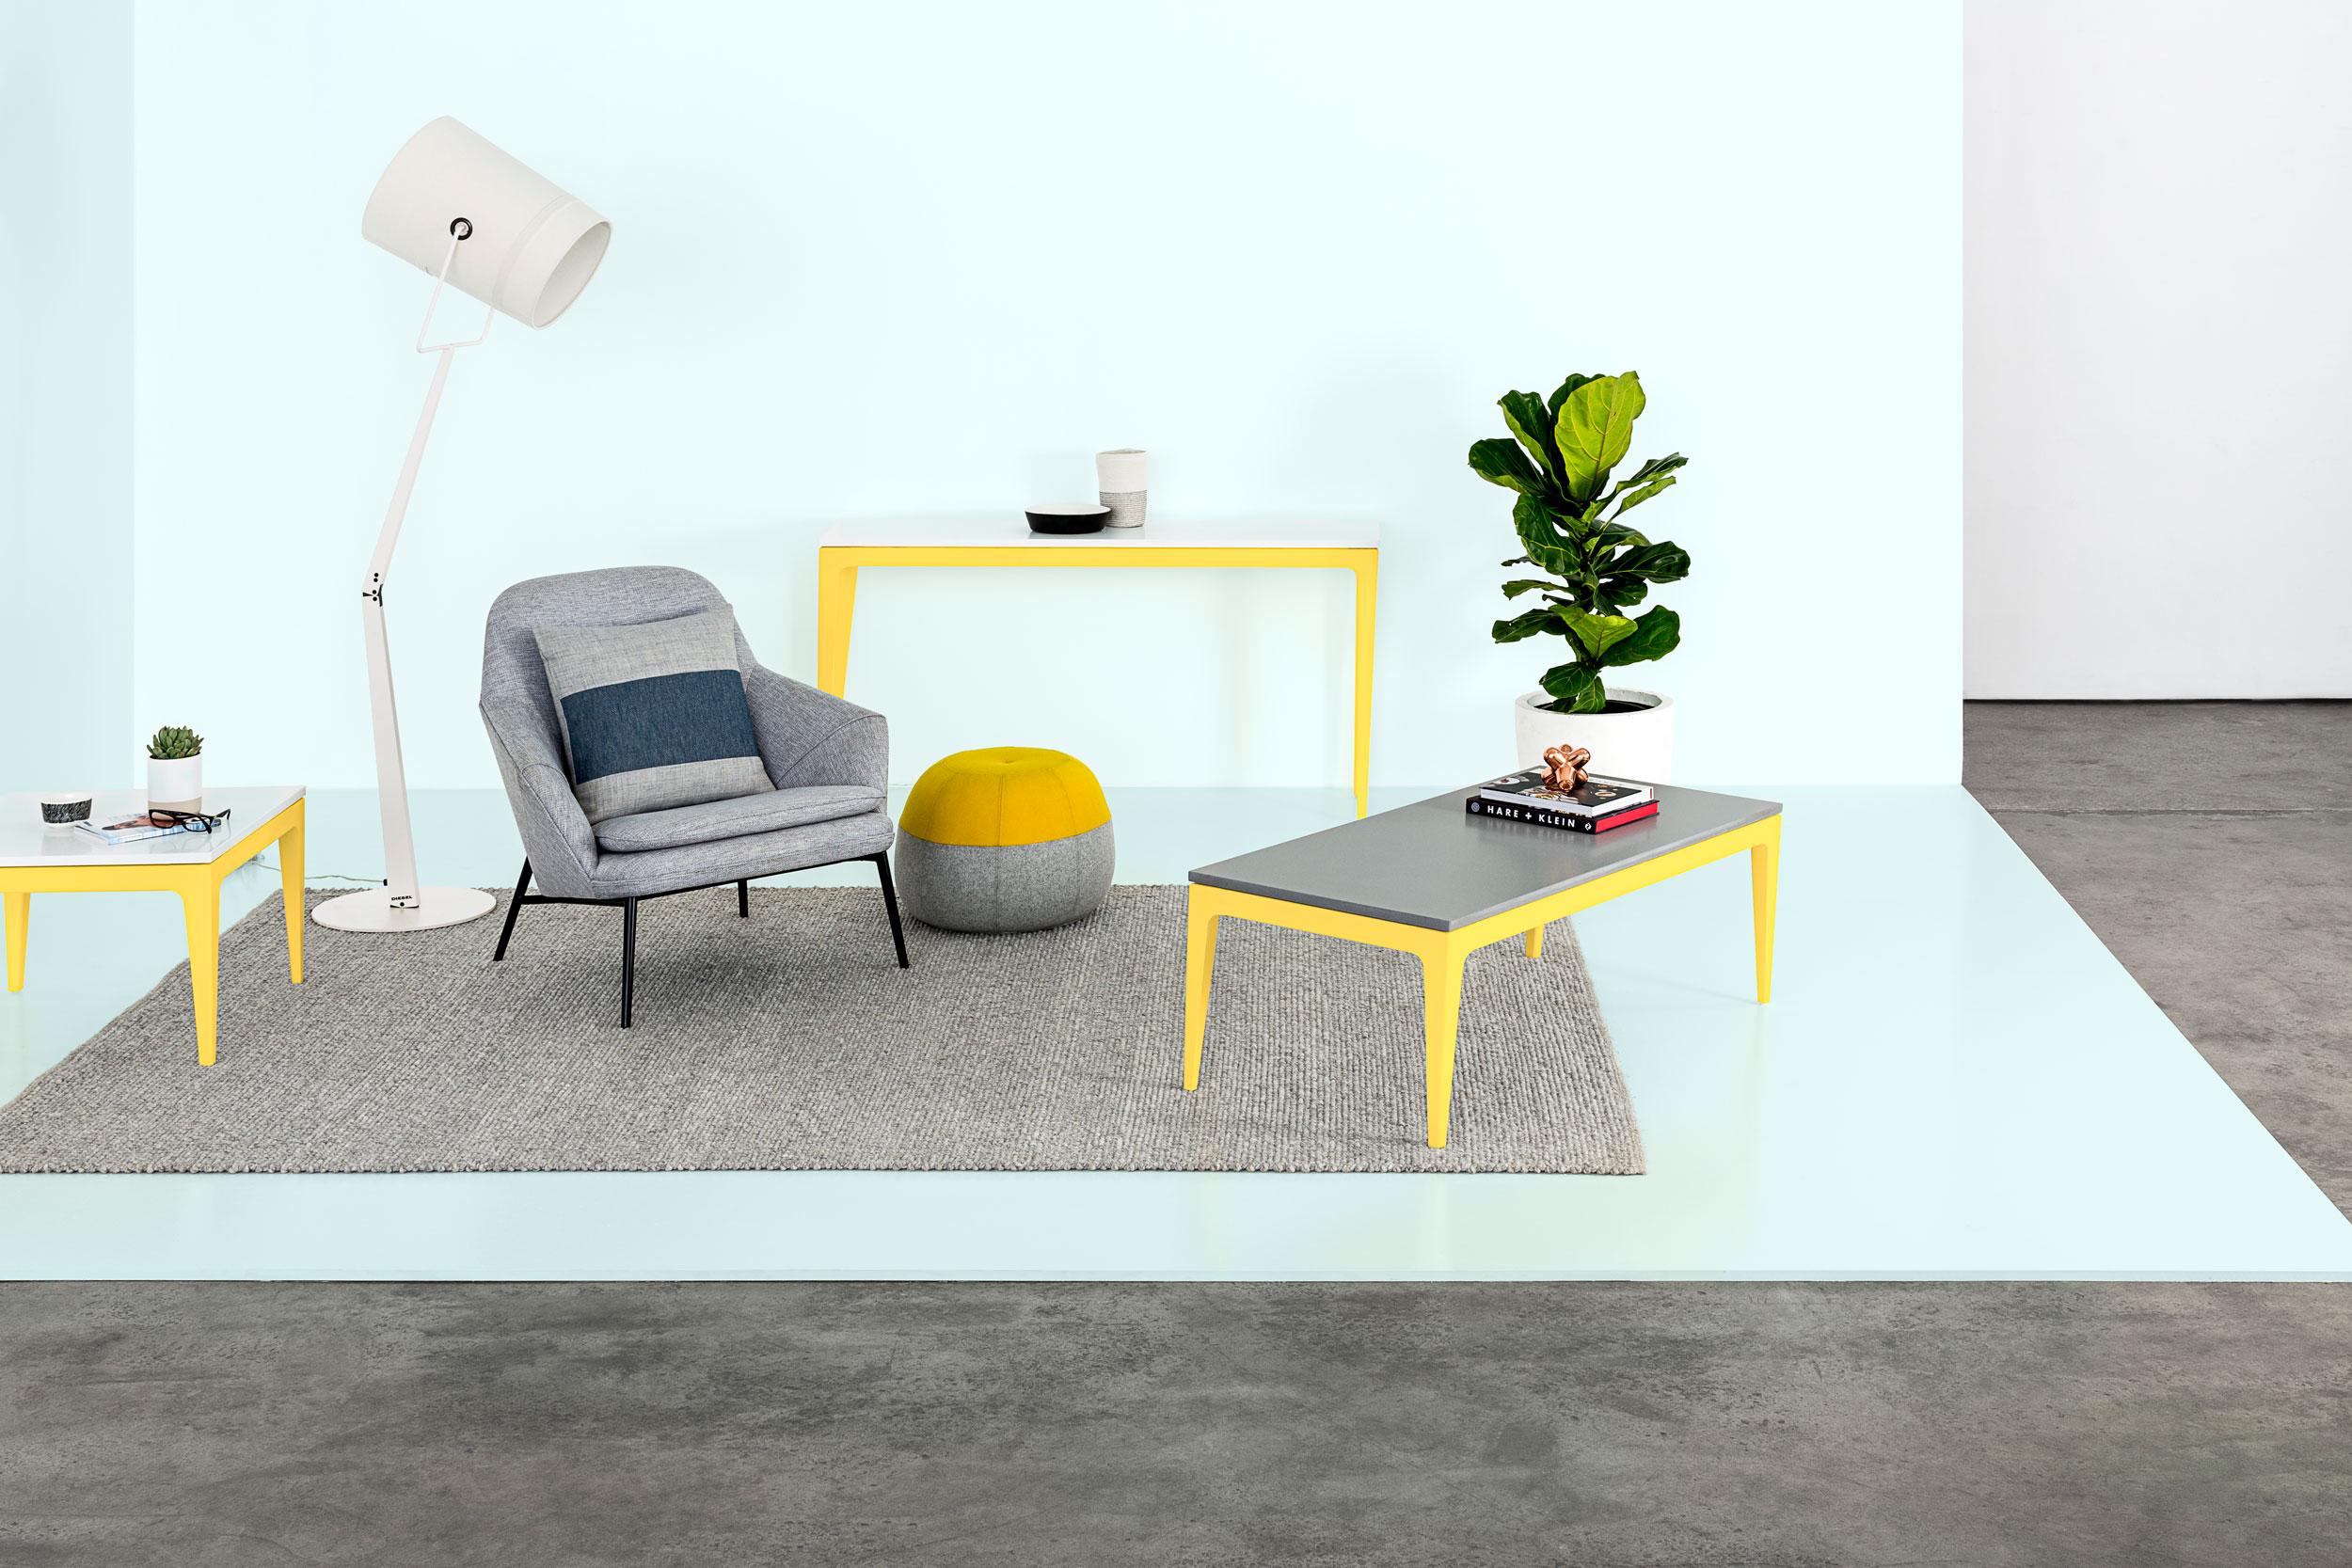 Urbi_table_stone_concrete_cesarstone_bek_sheppard_stylist_sarah_anderson_photography